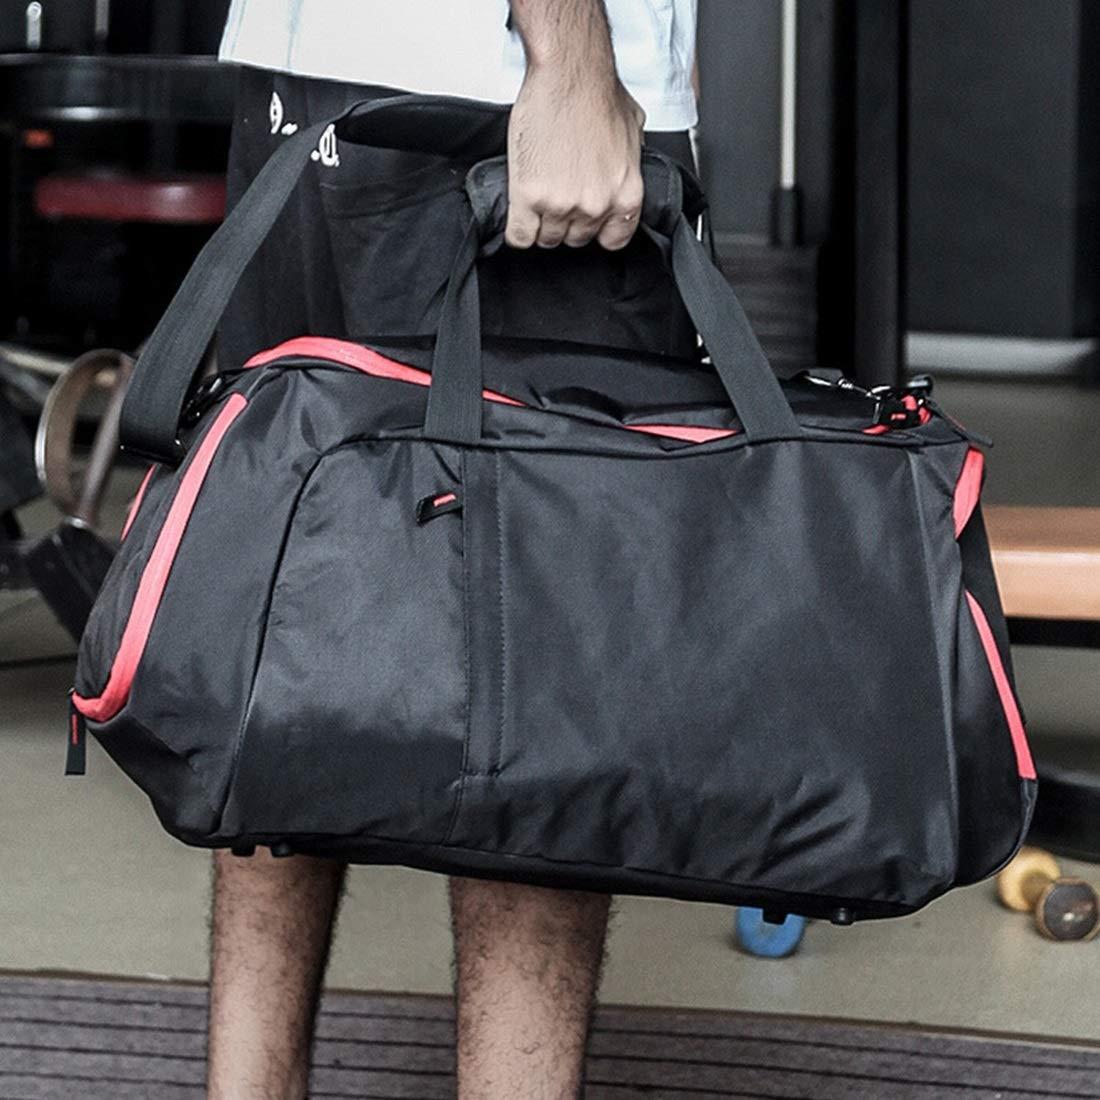 Souliyan Fitness Sports Bag Basketball Bag Training Bag Travel Bag with Shoe Compartment Black